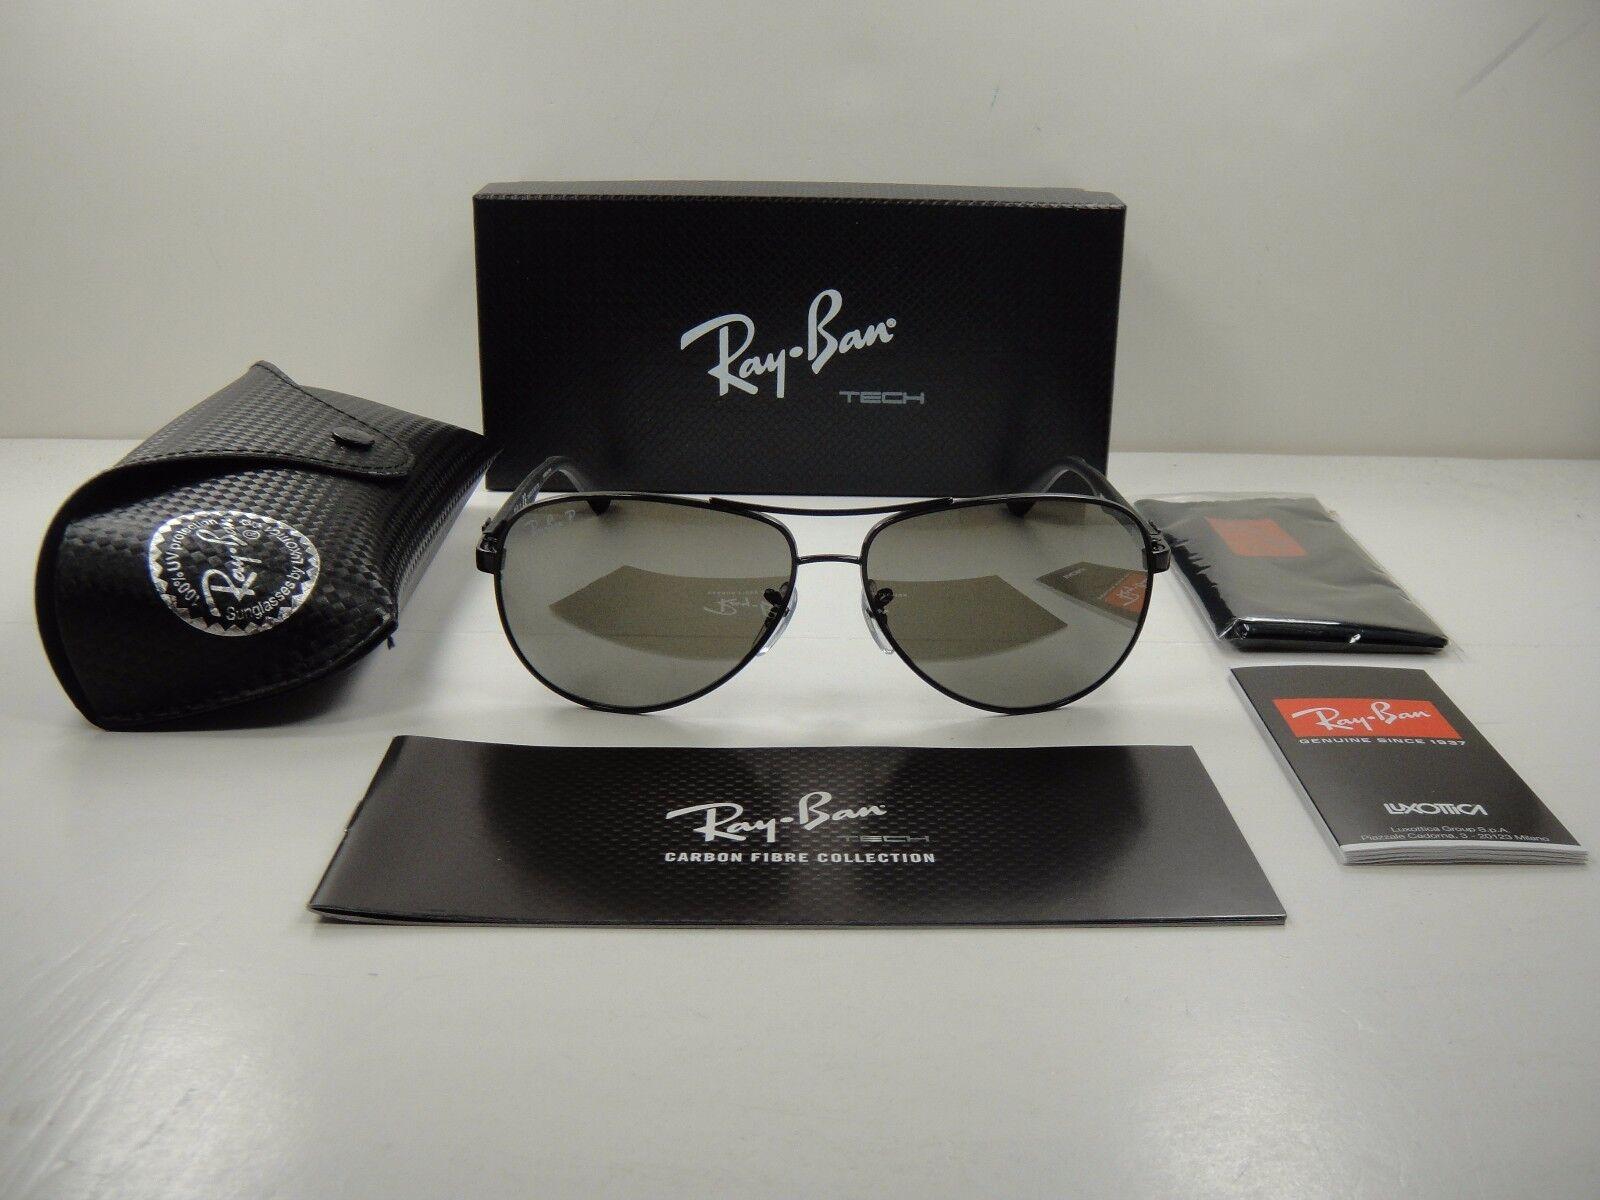 006a872f29b Ray Ban Rb8313 002 k7 Black Carbon Fiber Sunglasses Polarized Lens ...